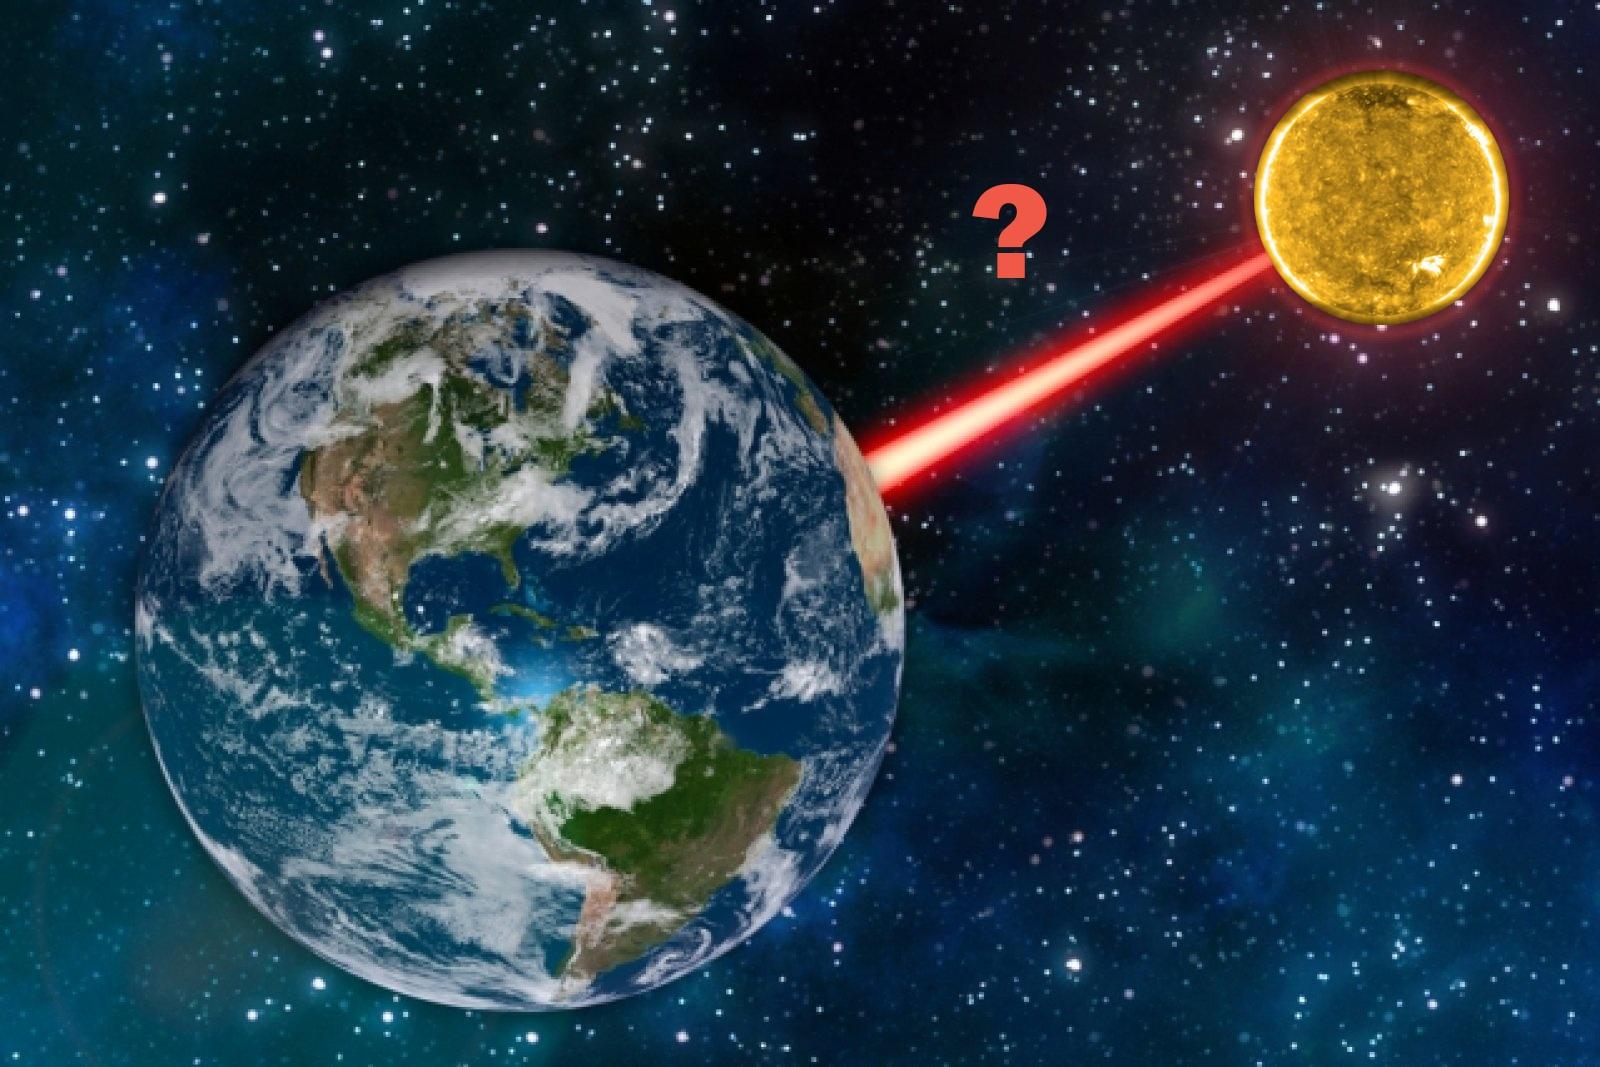 Как измерили расстояние до Солнца - 1